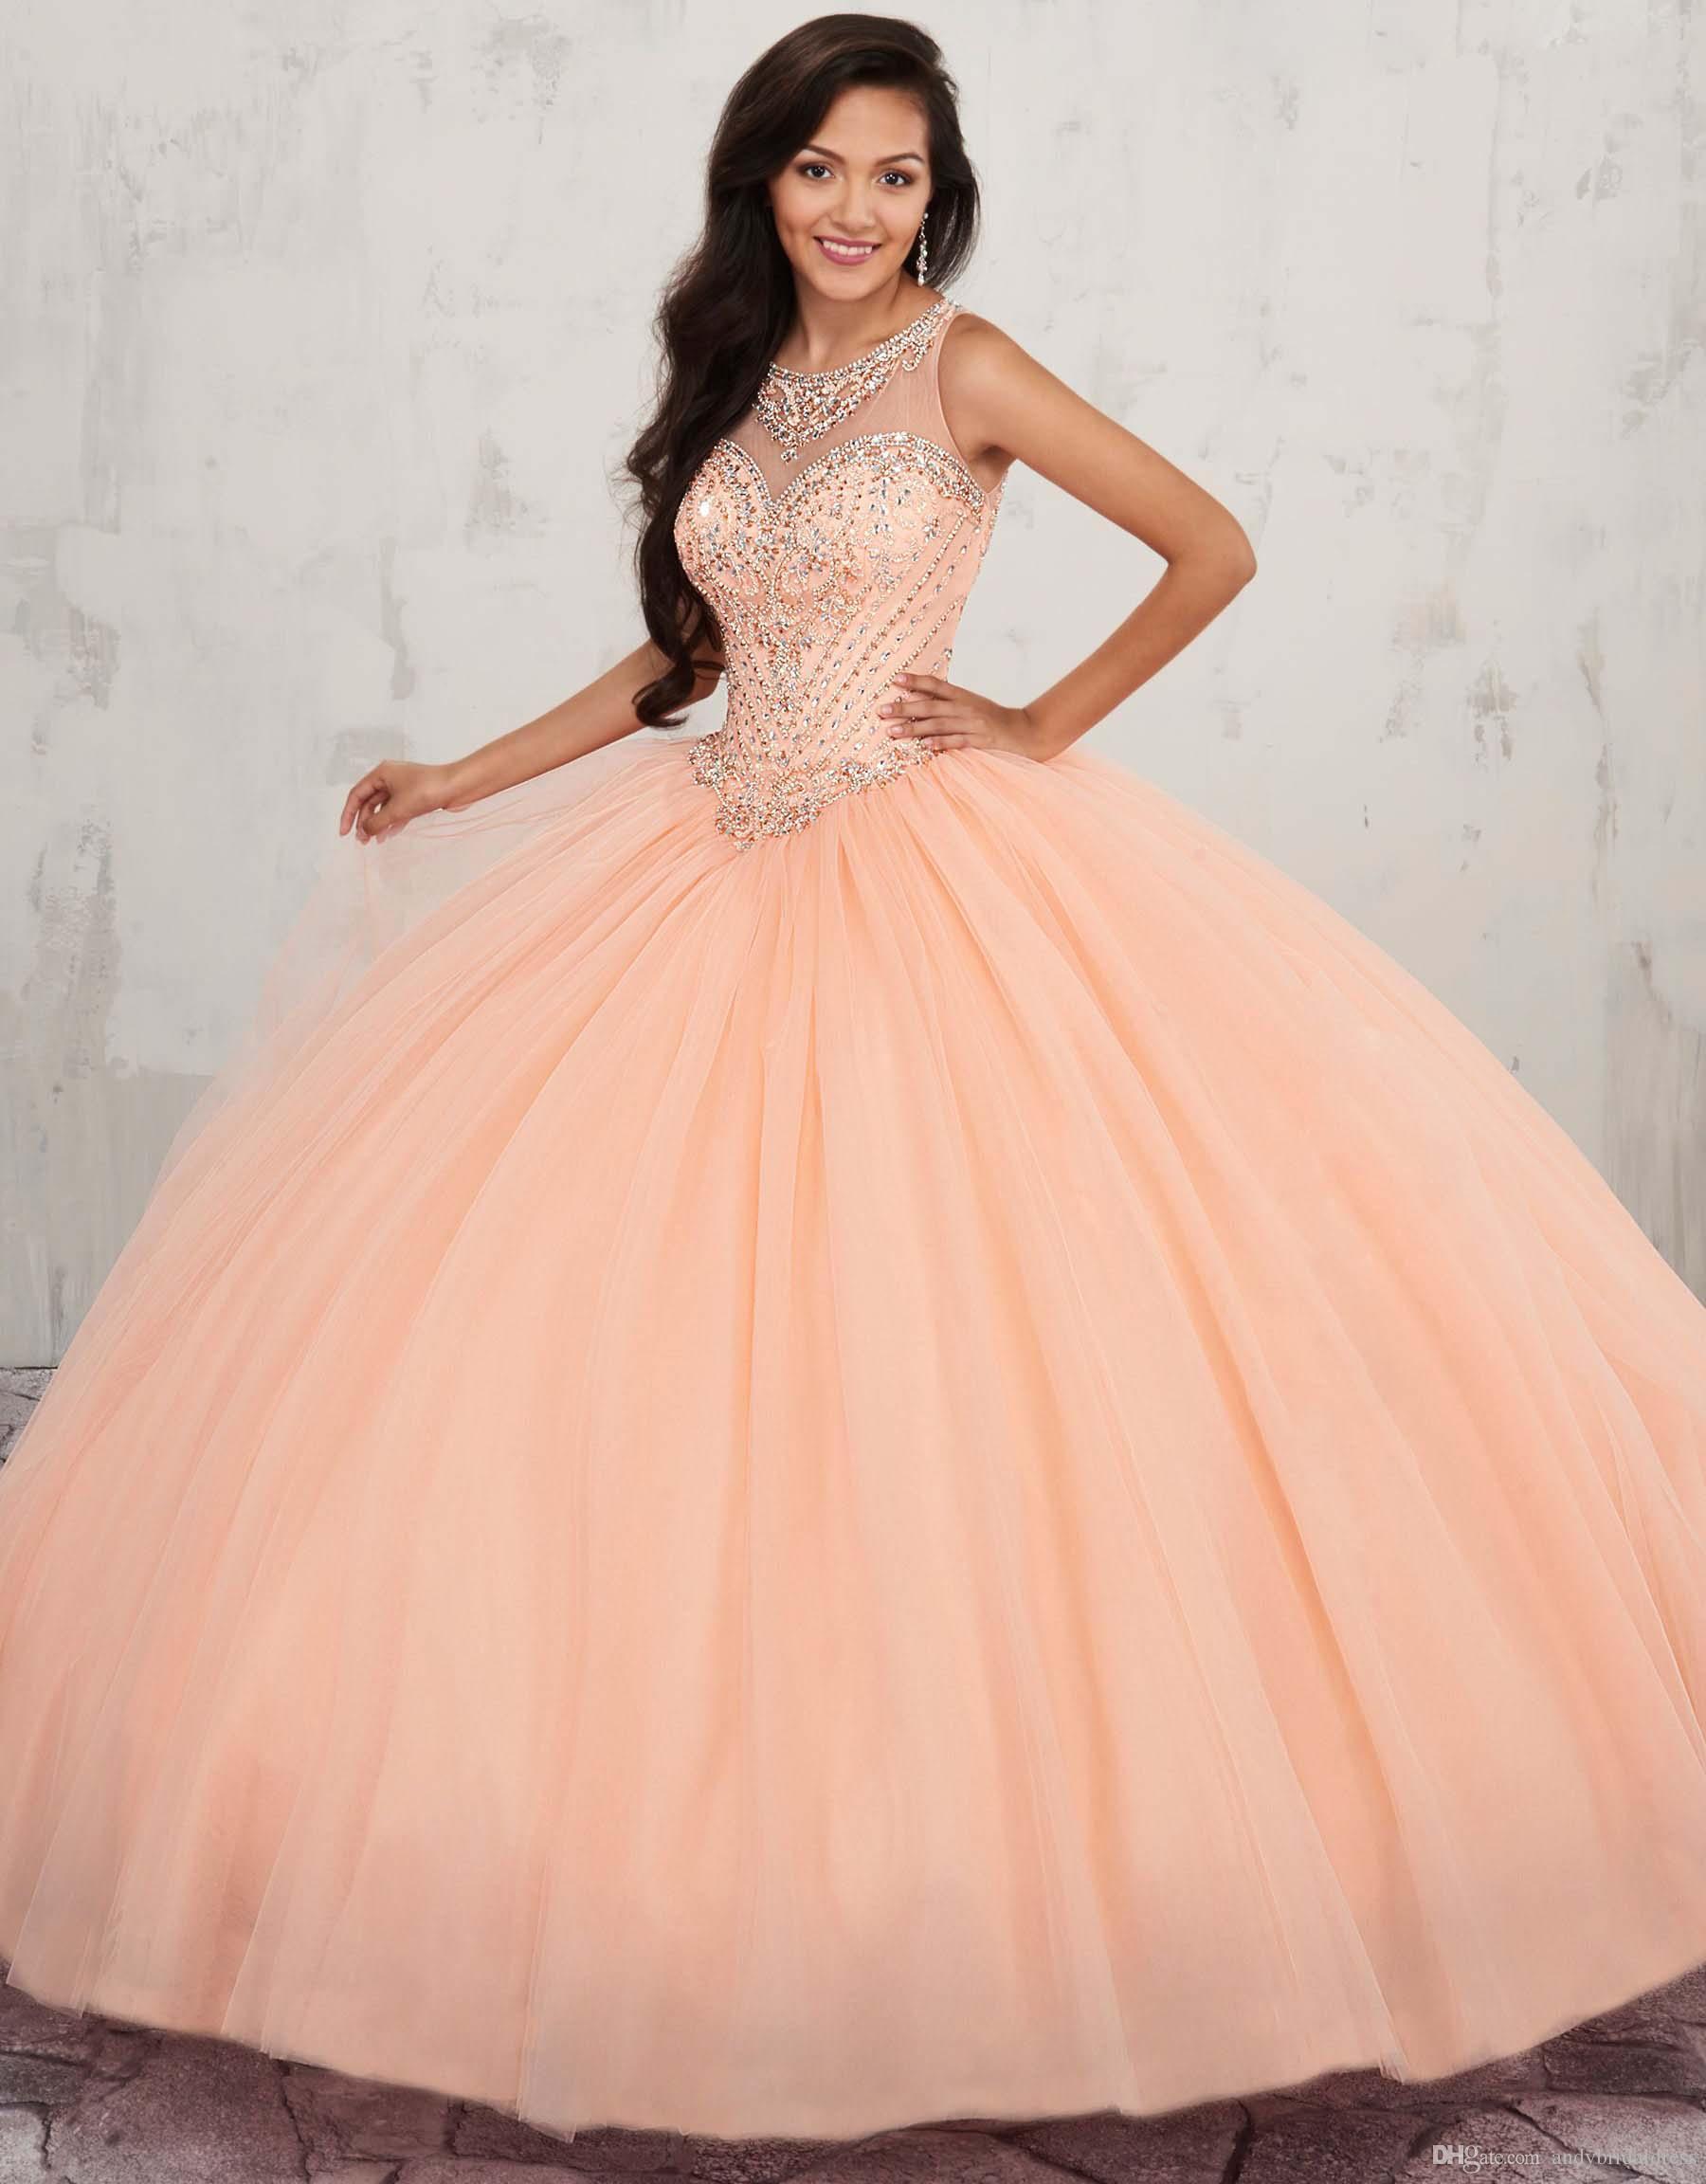 2 Piece Quinceanera Dresses 2019 Cheap Online